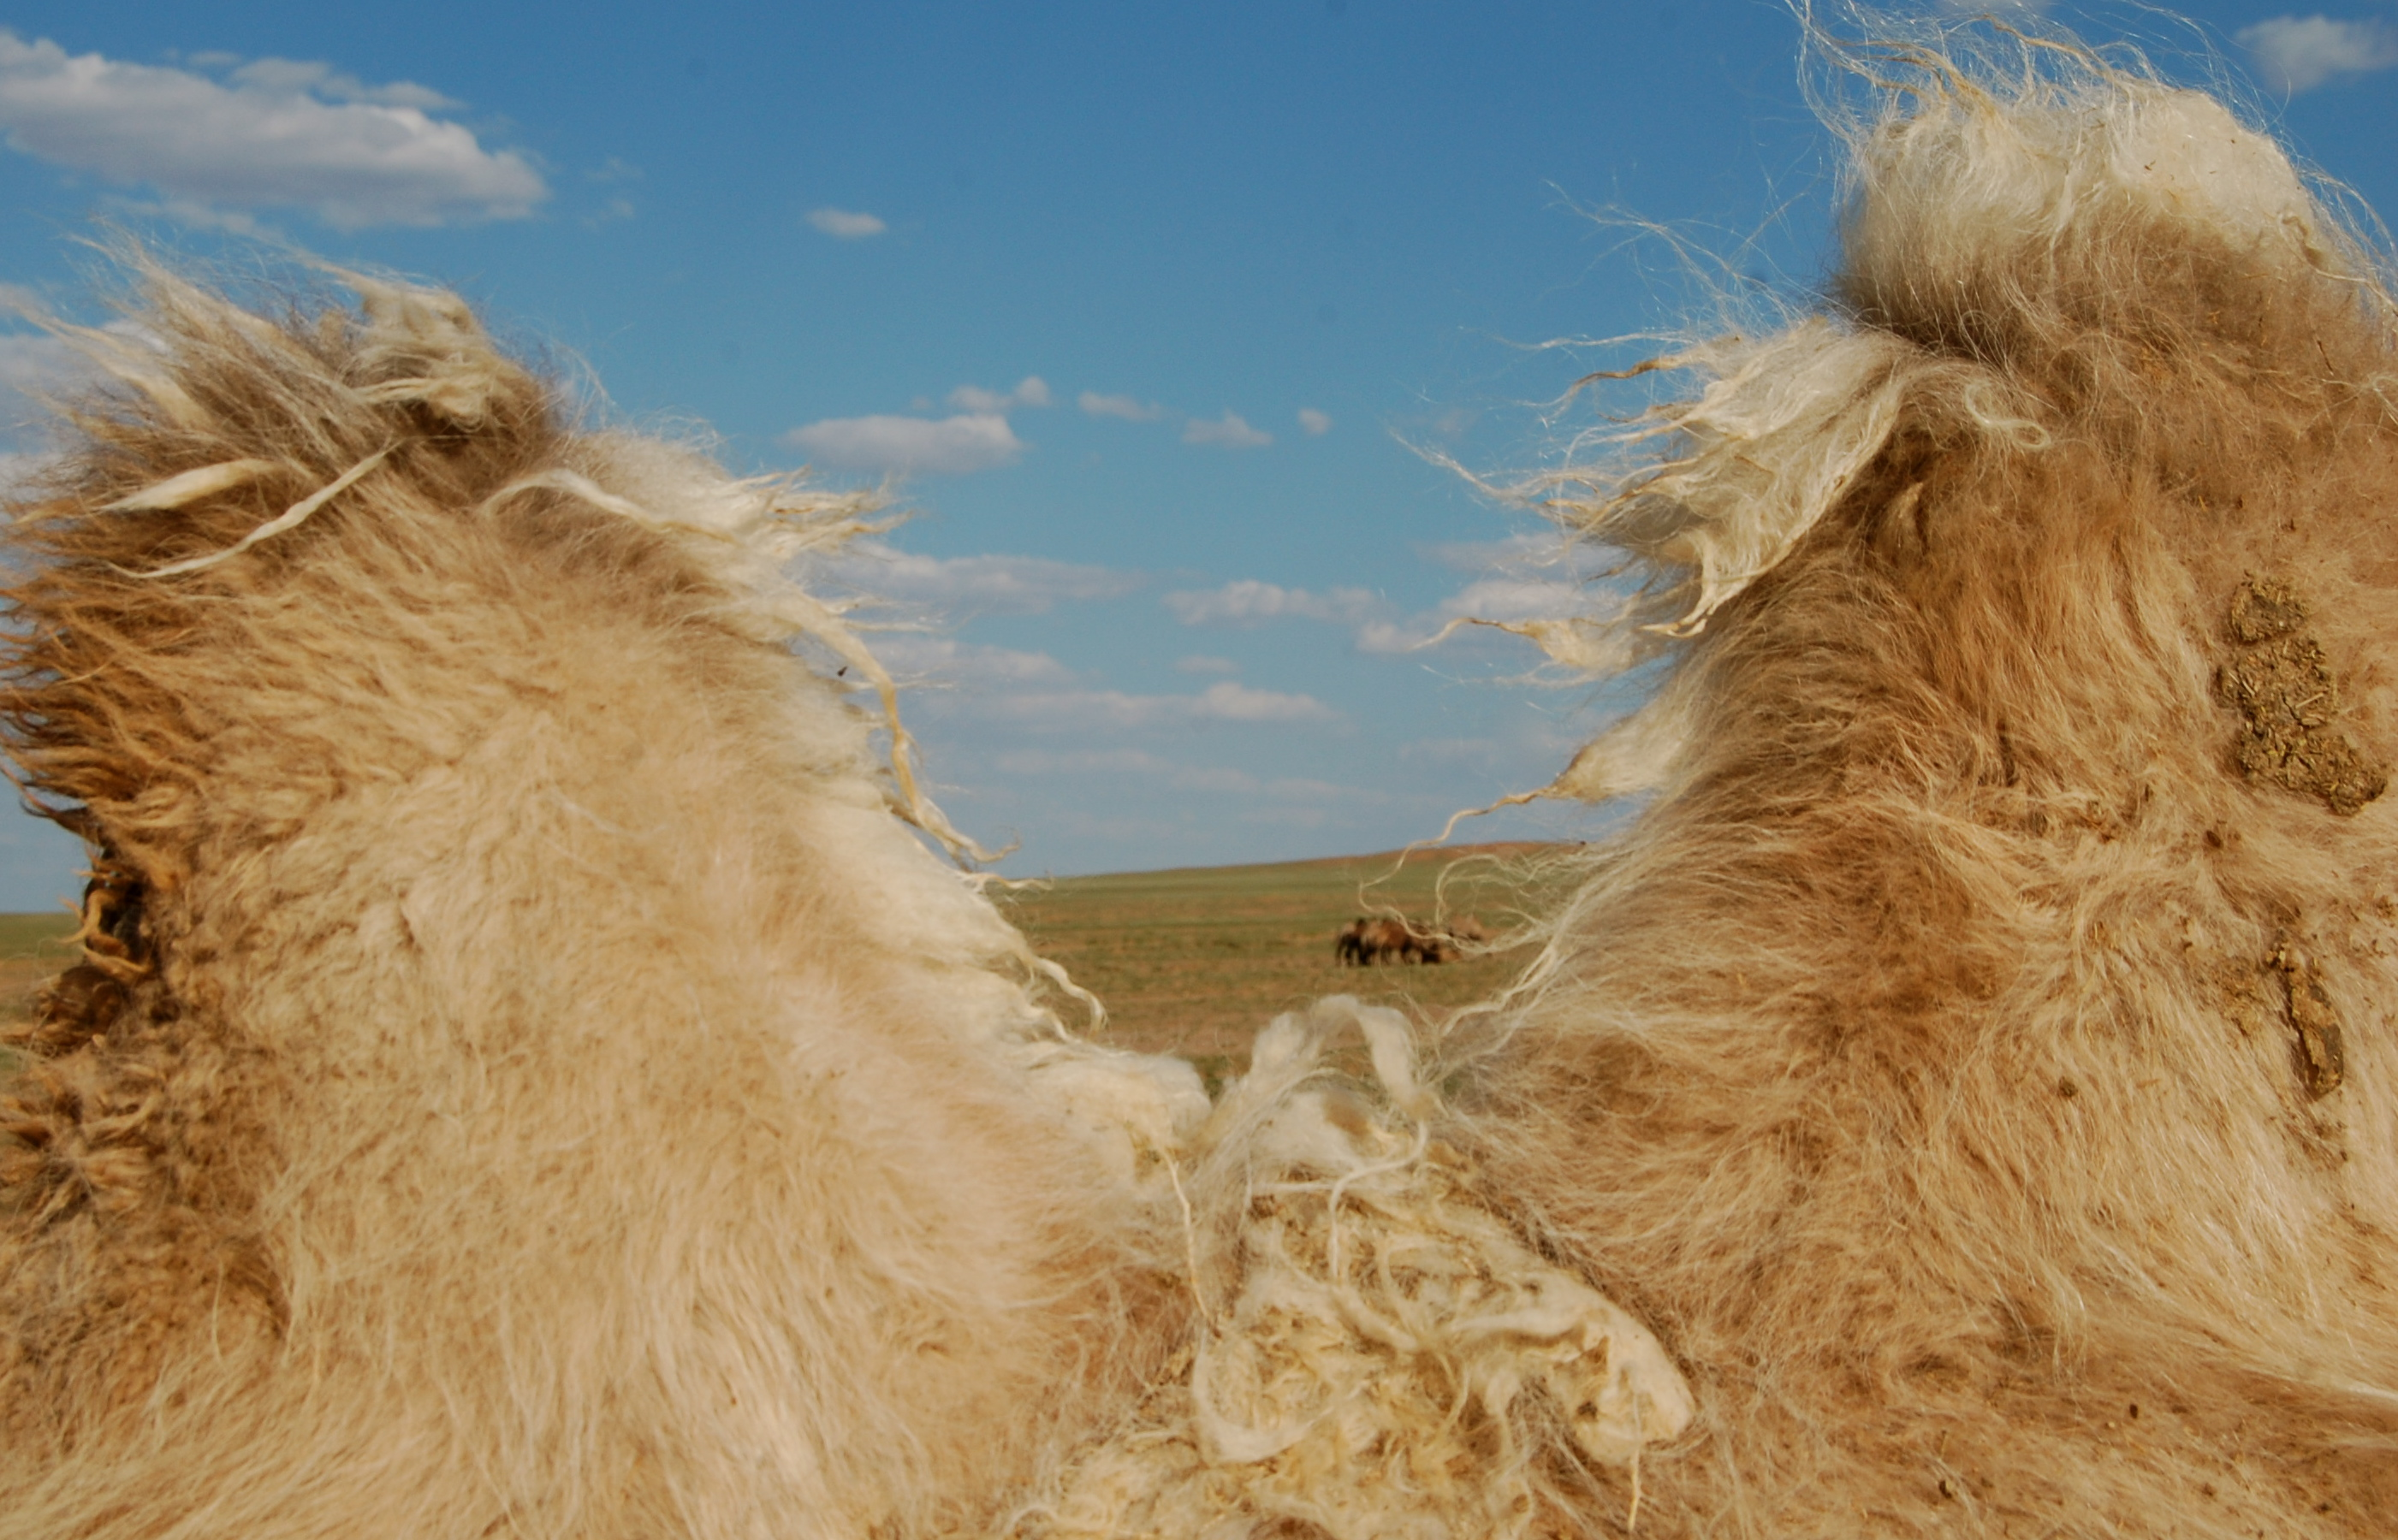 Mongolian camel